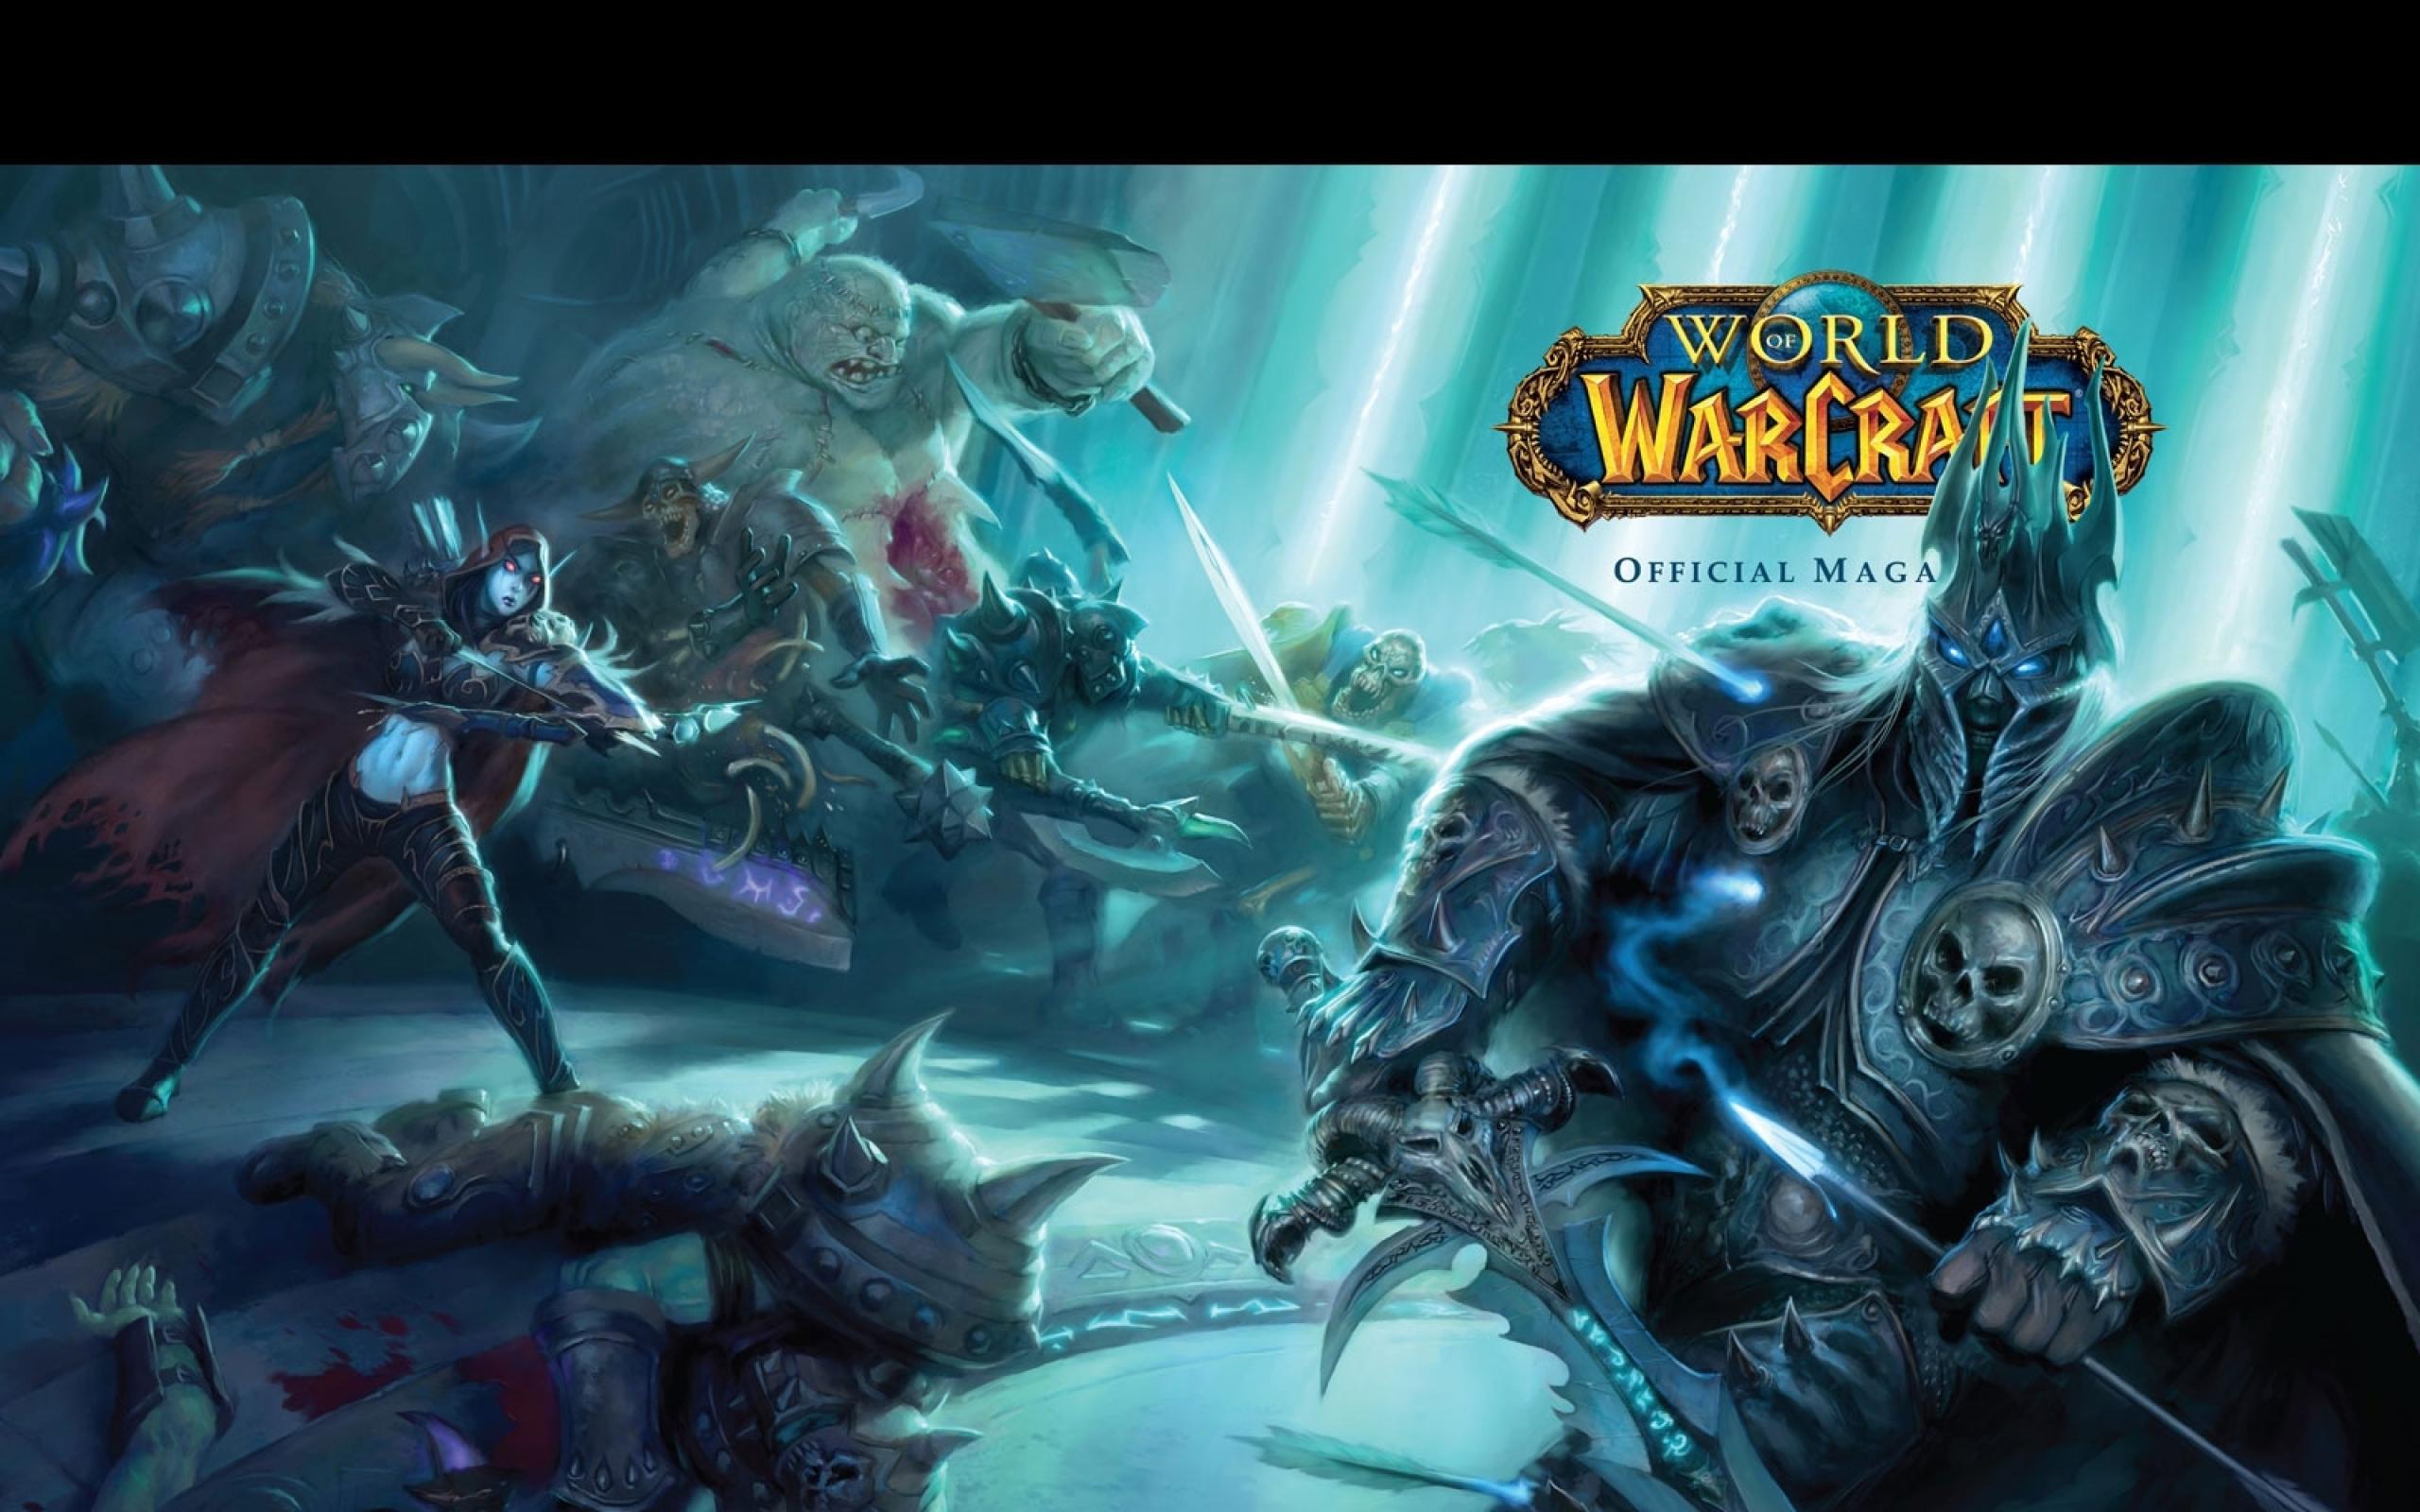 Download Wallpaper Wow Arthas World Of Warcraft Menethil